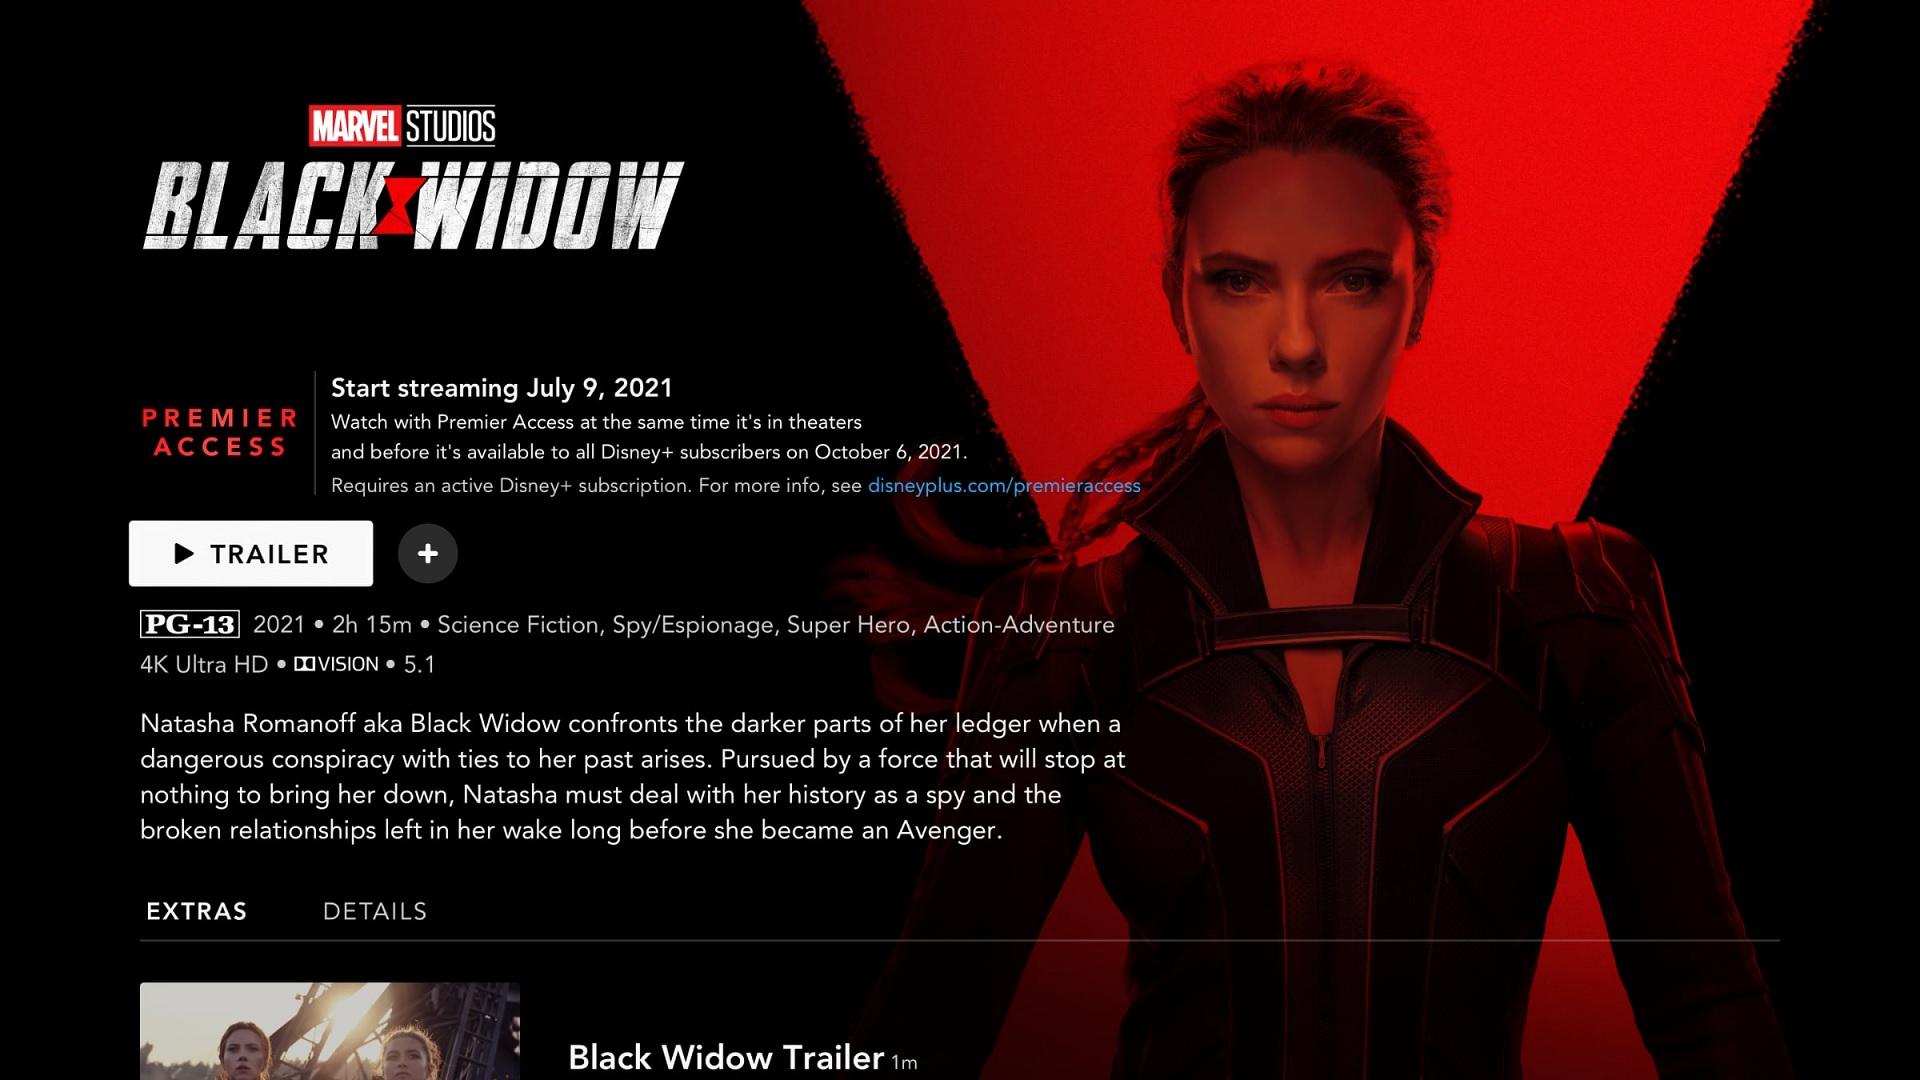 Disney+ Black Widow Premier Access